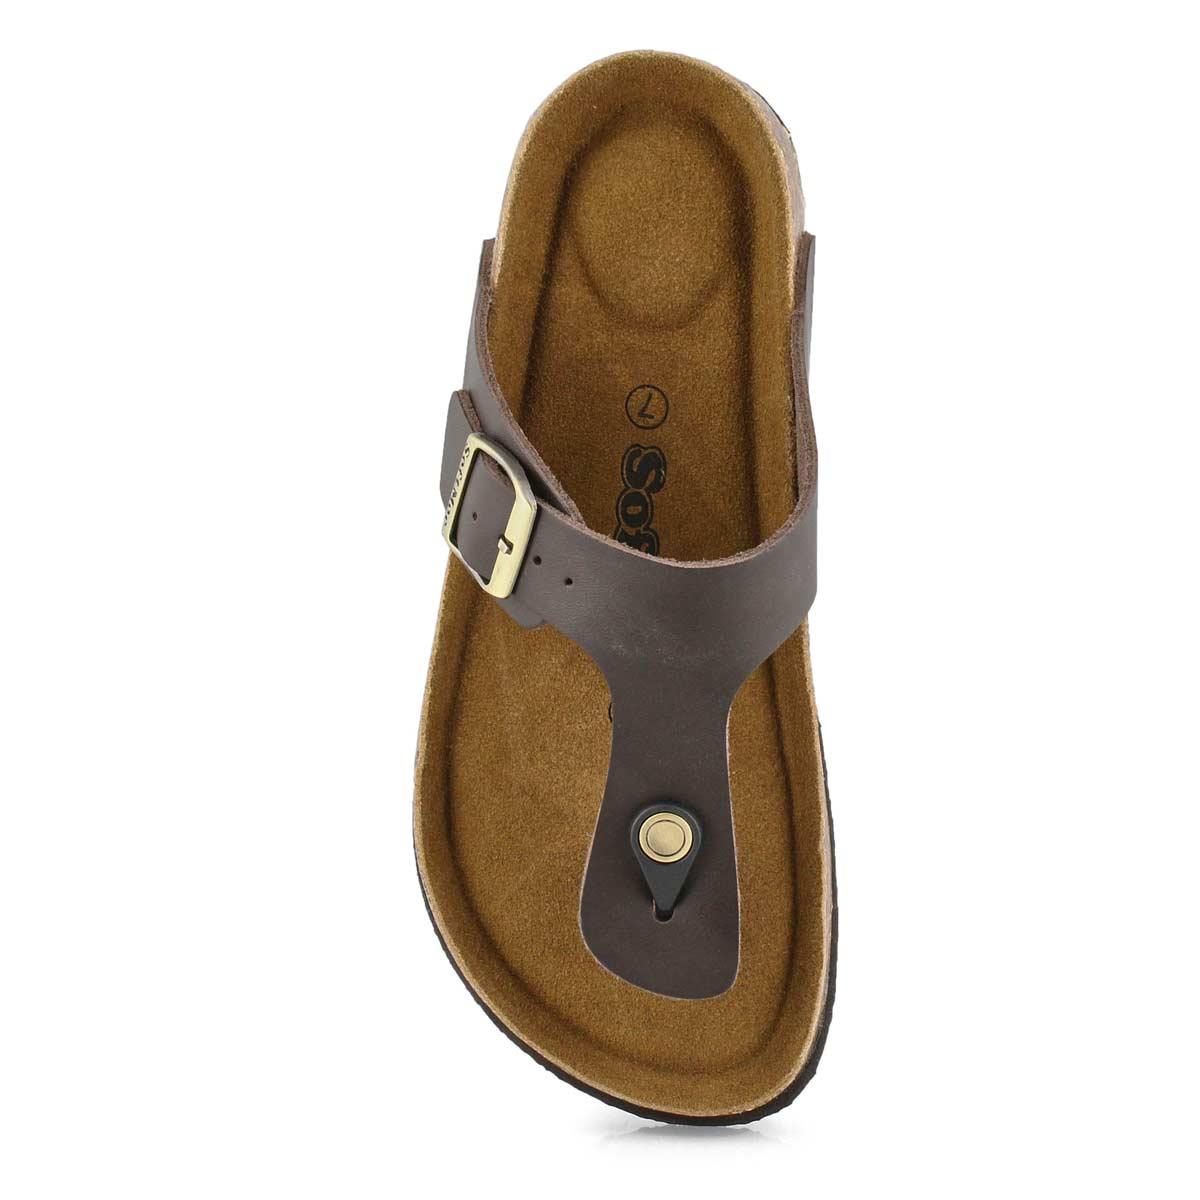 Lds Angy 5 brn memory foam thong sandal